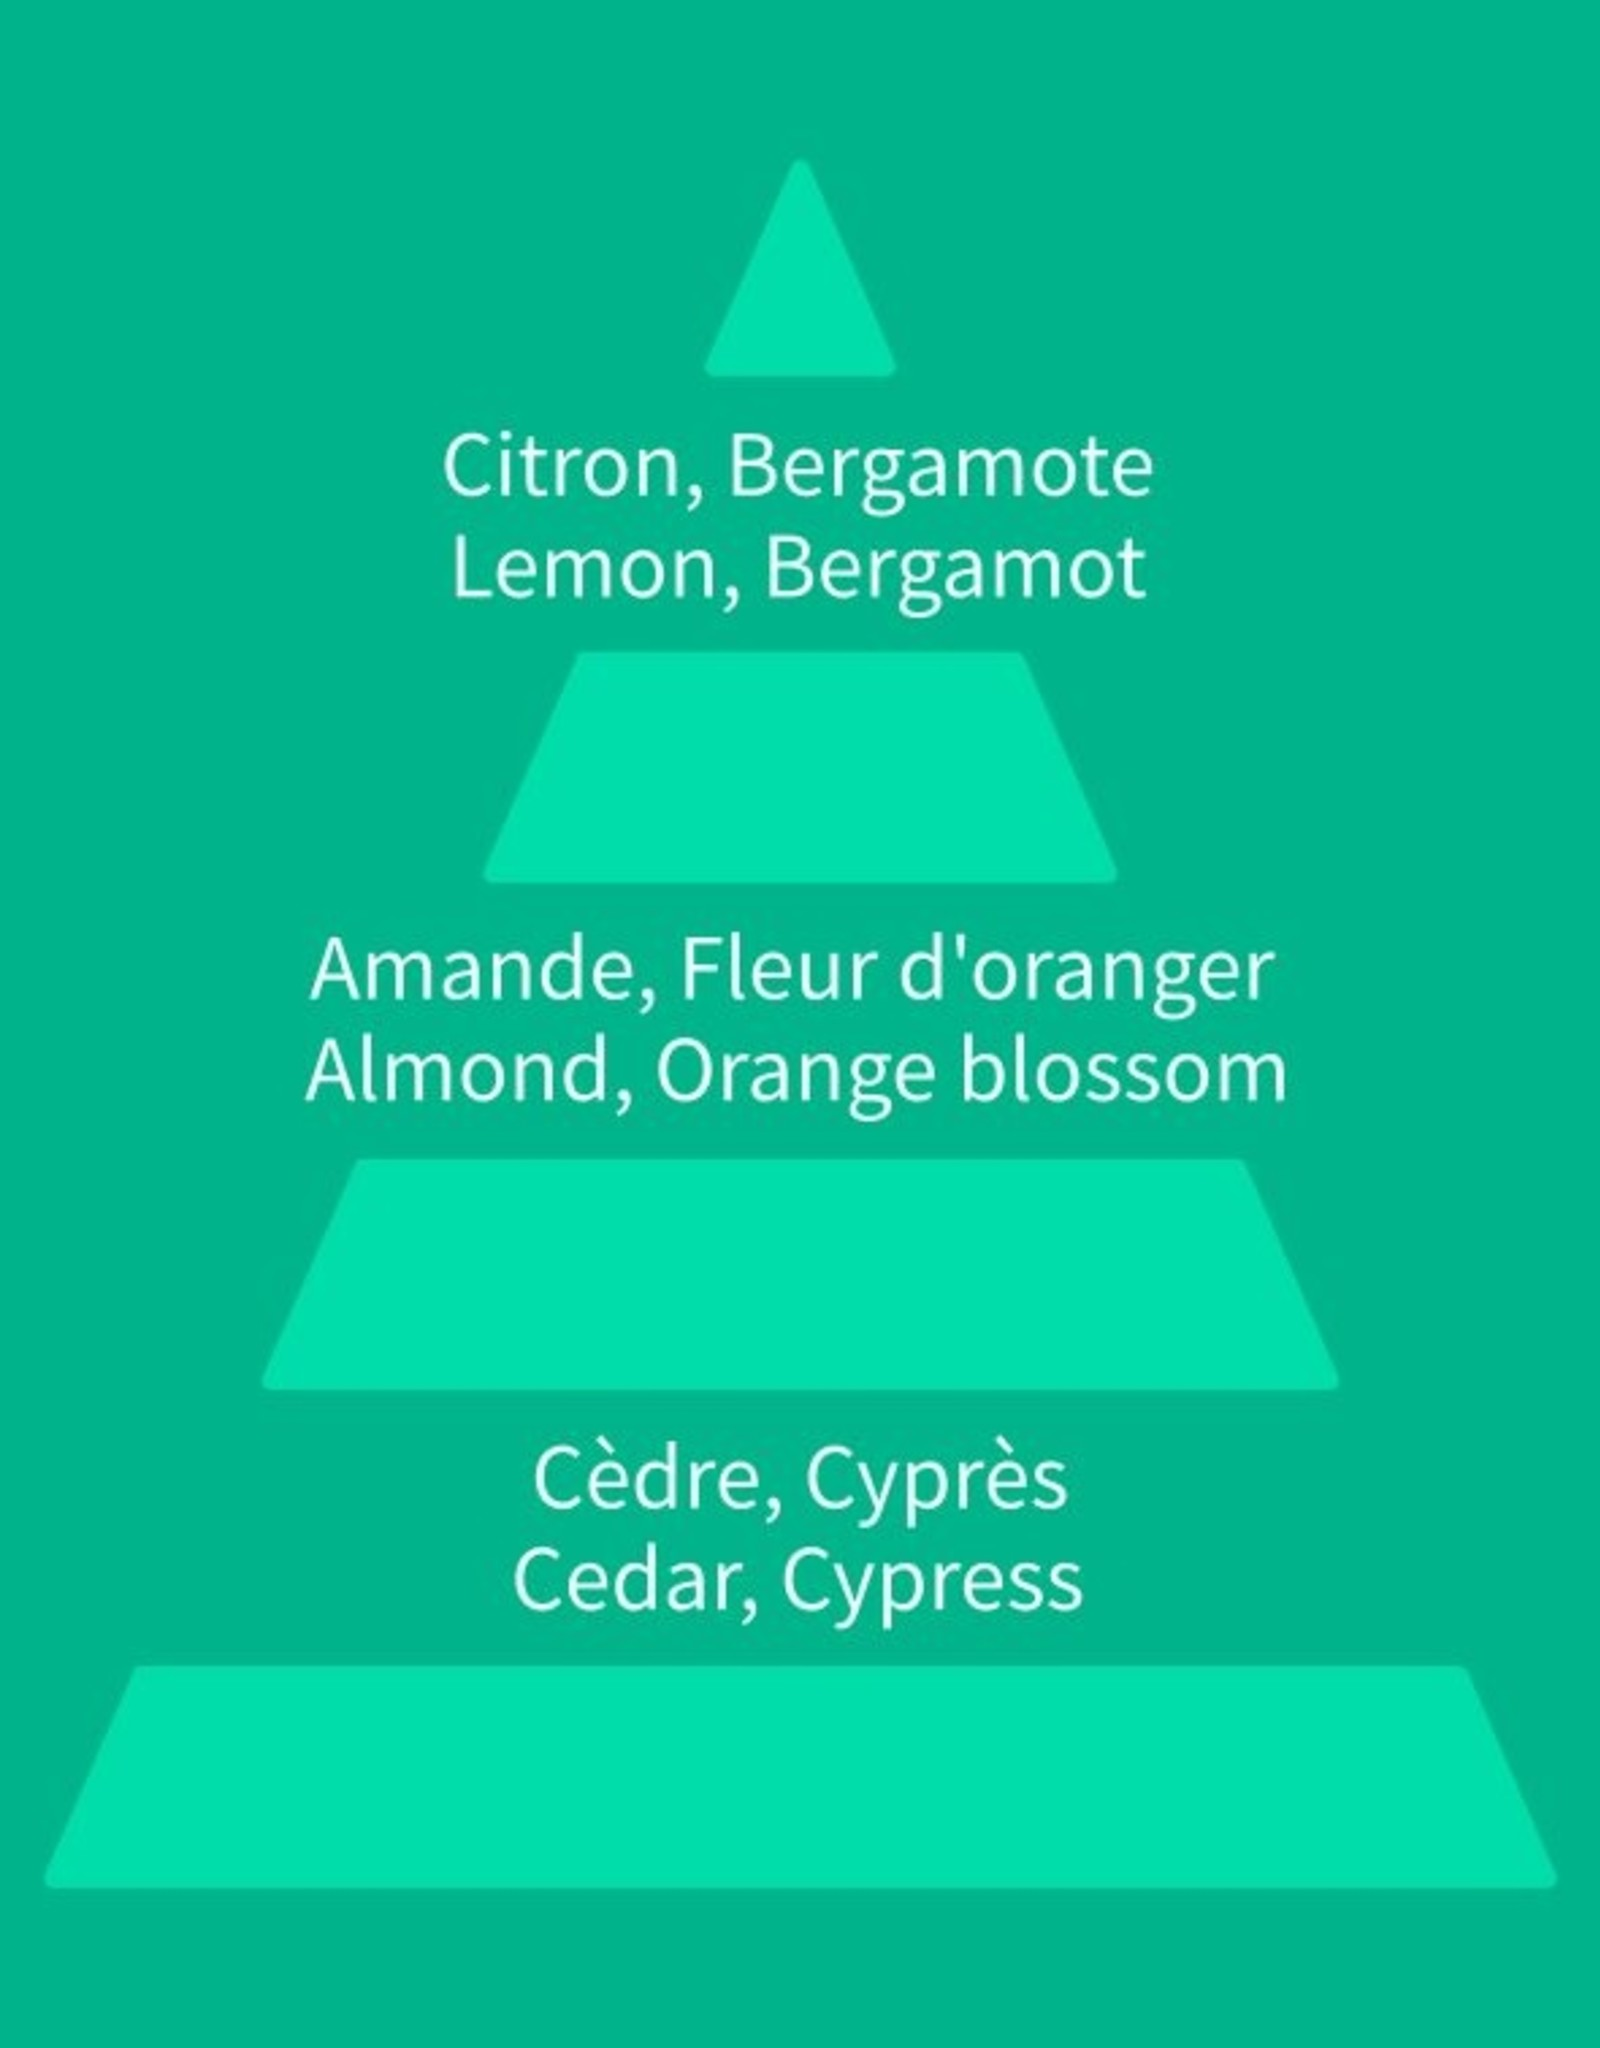 Equivalenza Citrus Floral 013